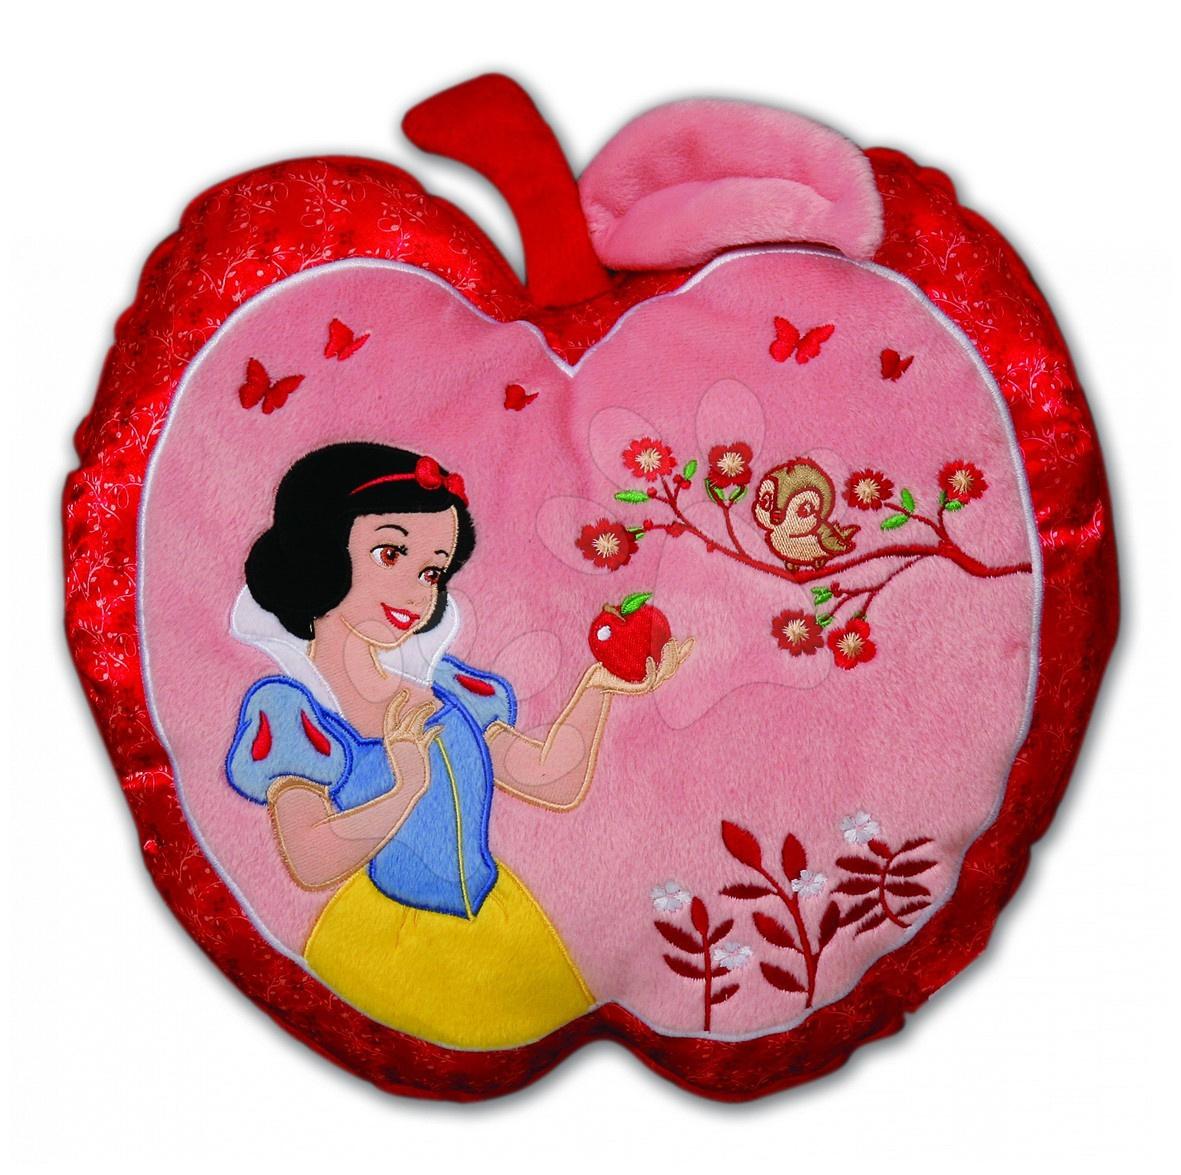 Vankúš Princezné Snehulienka Ilanit jabĺčko 36 cm